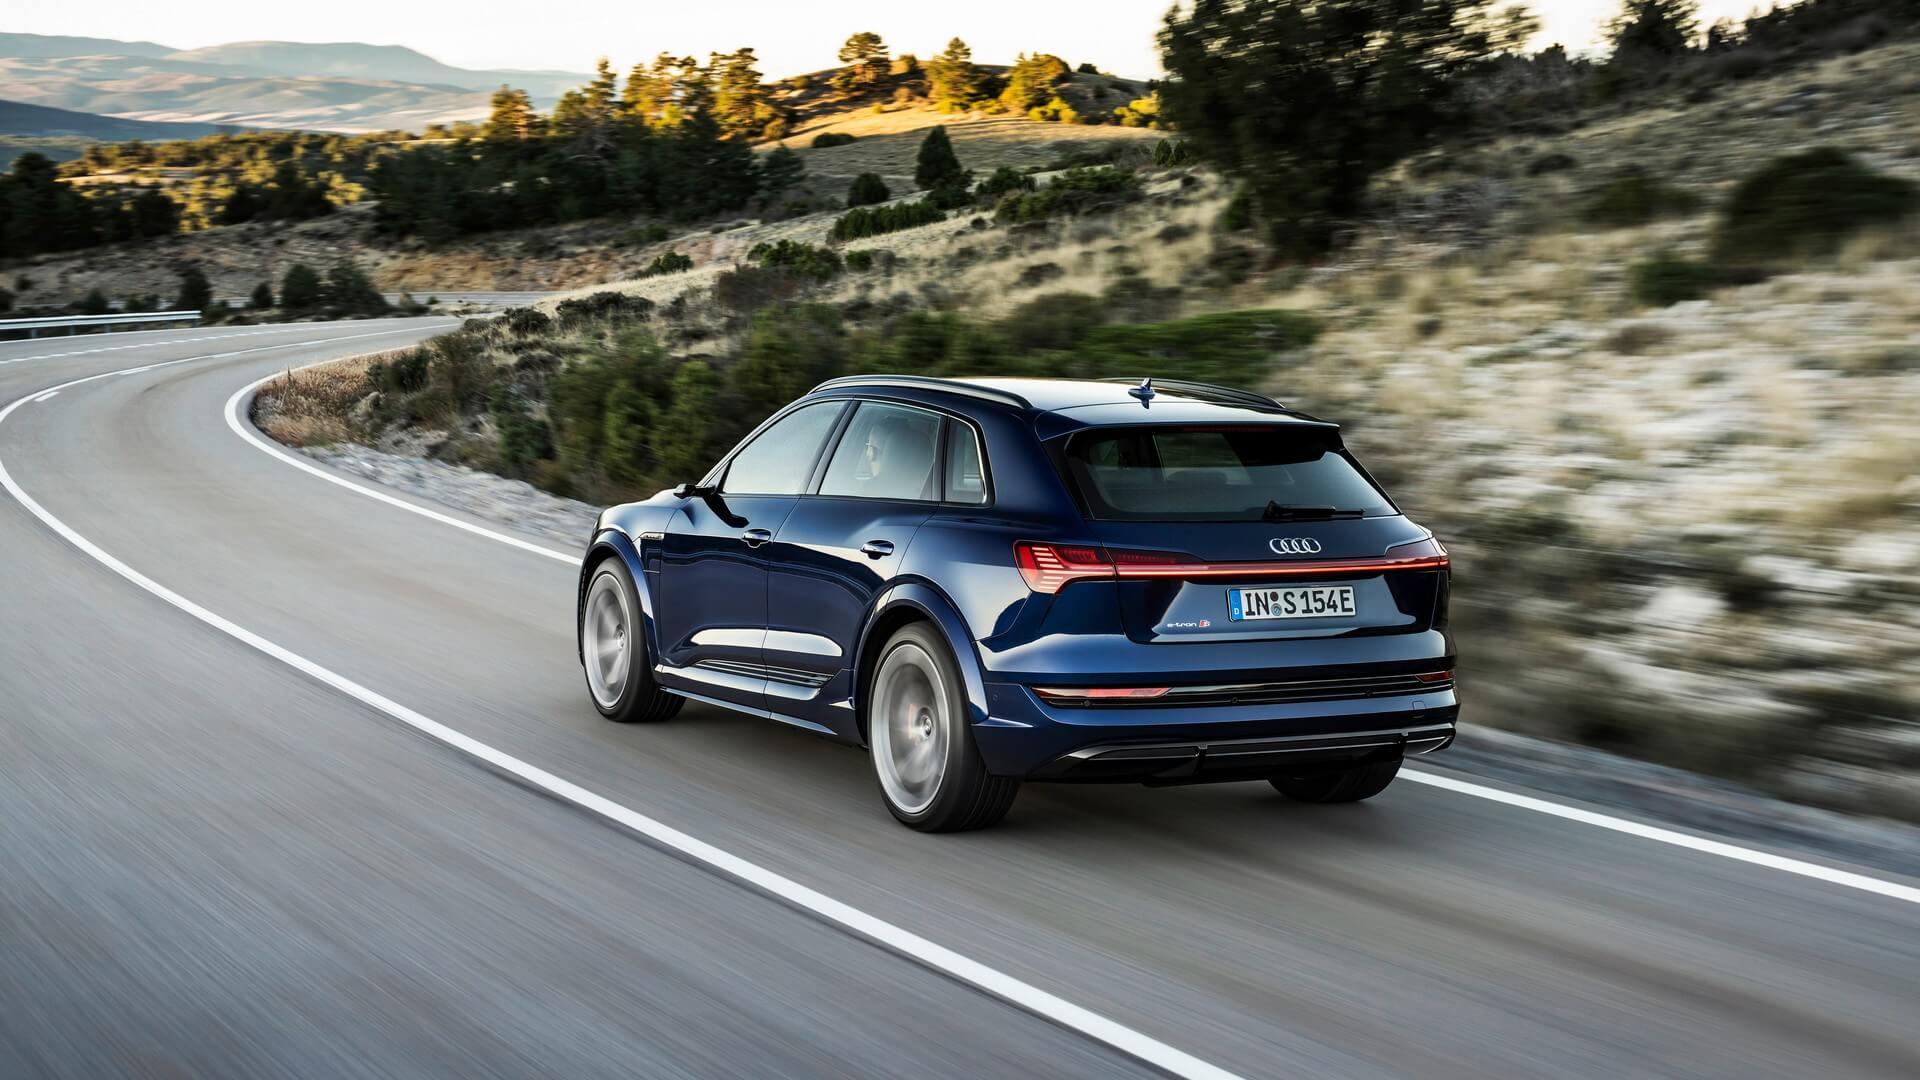 Audi-E-Tron-S-and-E-Tron-S-Sportback-2020-9